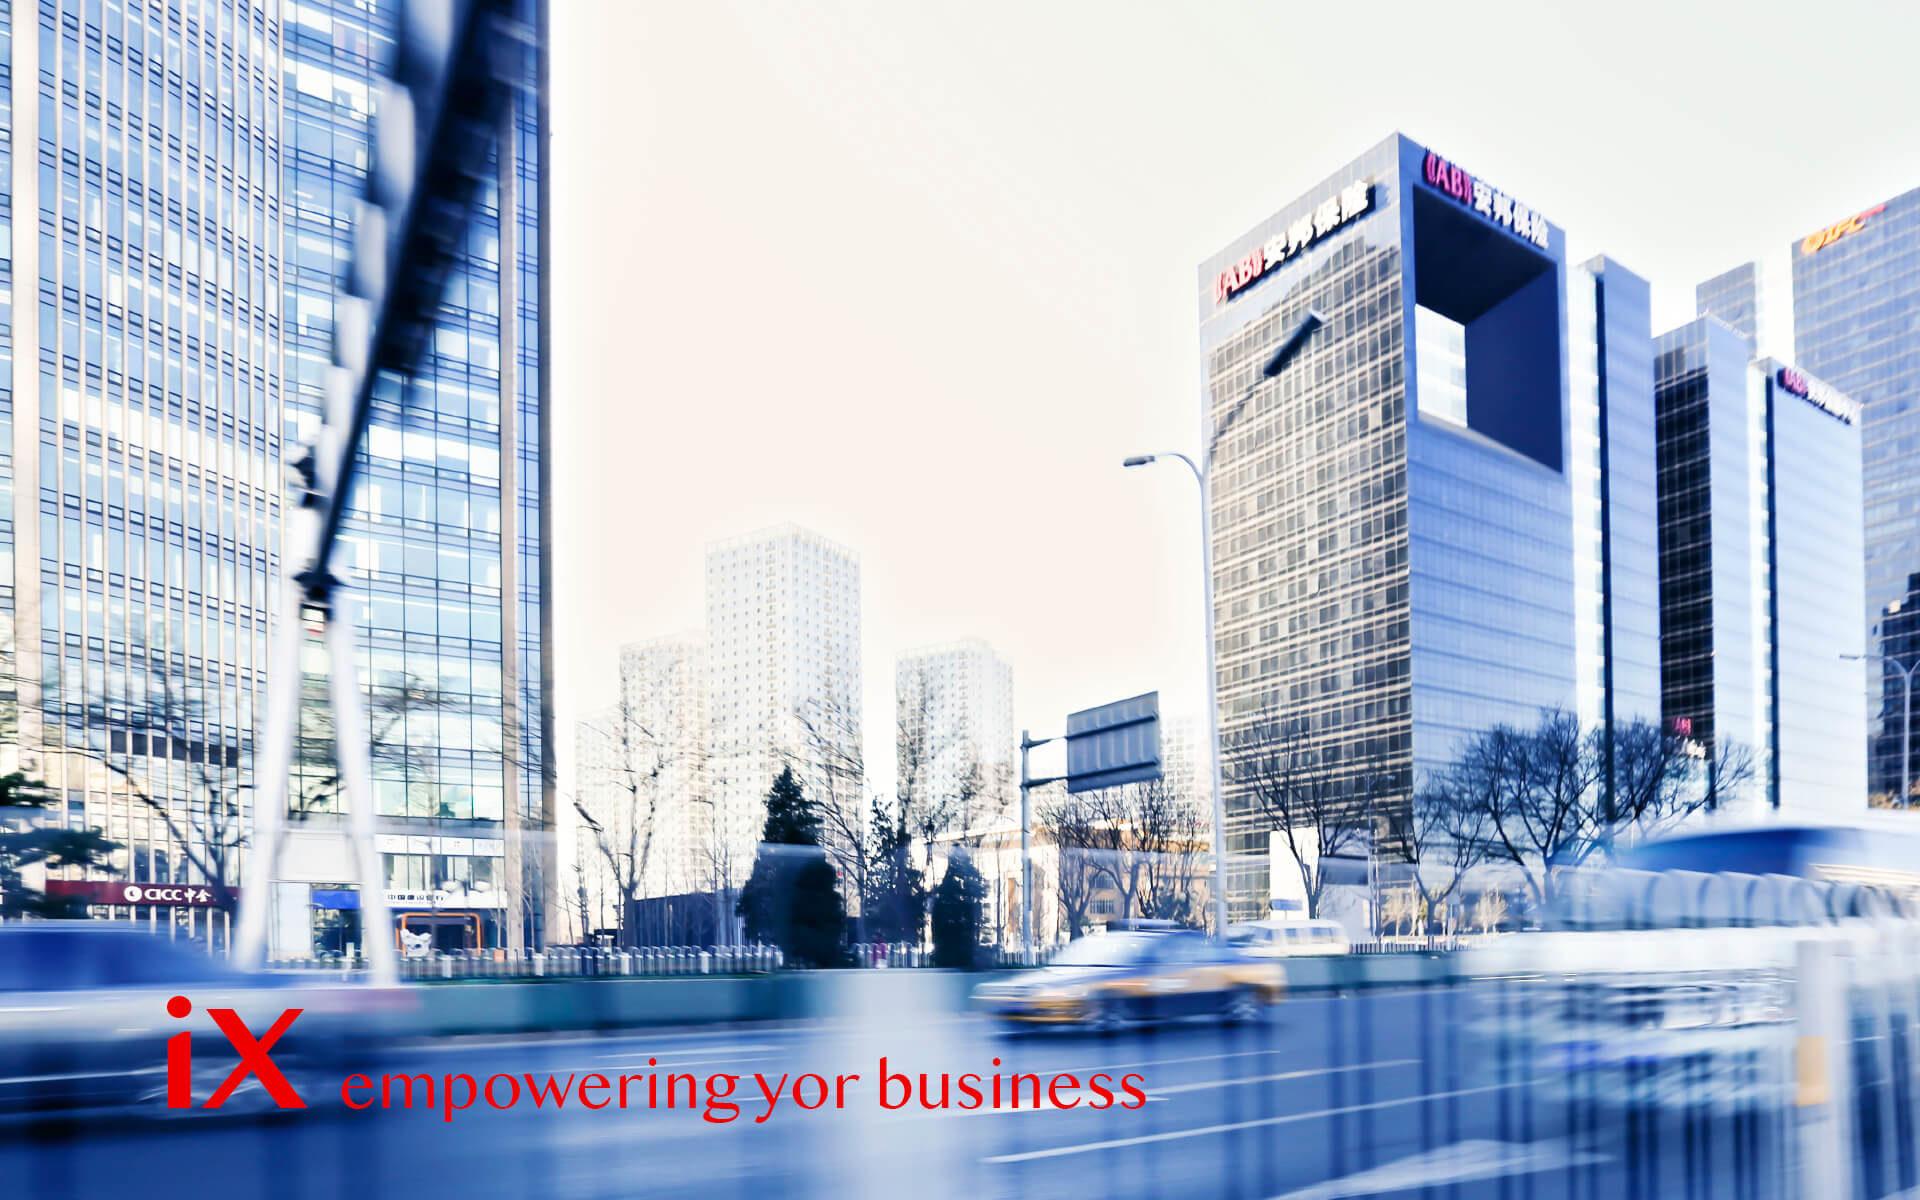 Studio iX empowering your business